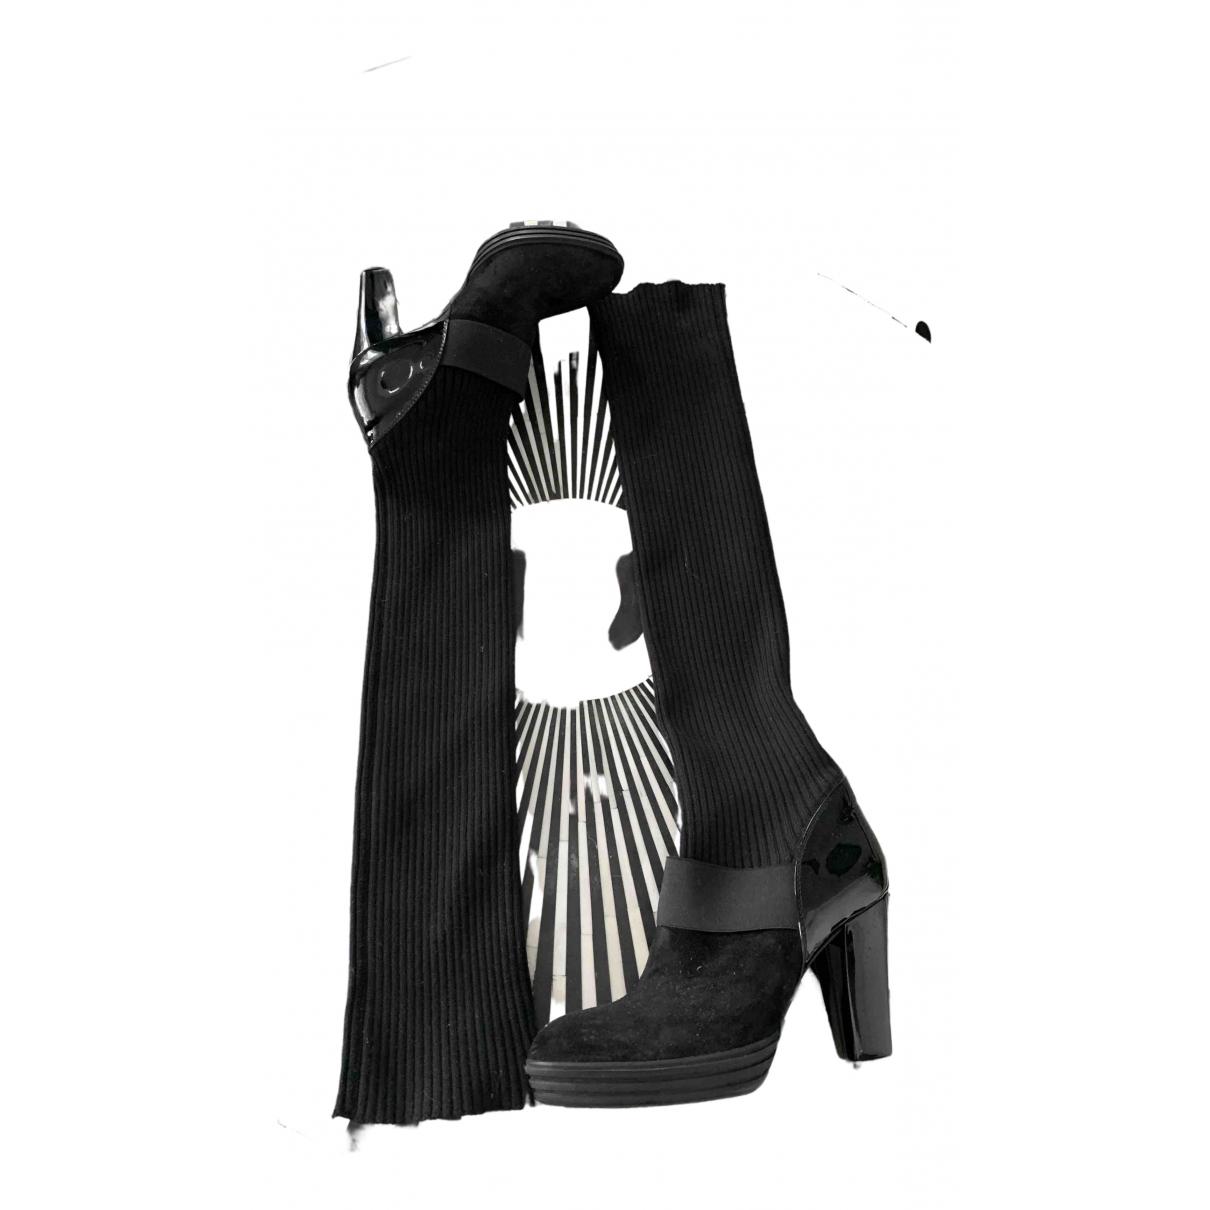 Hogan \N Black Suede Boots for Women 37.5 EU